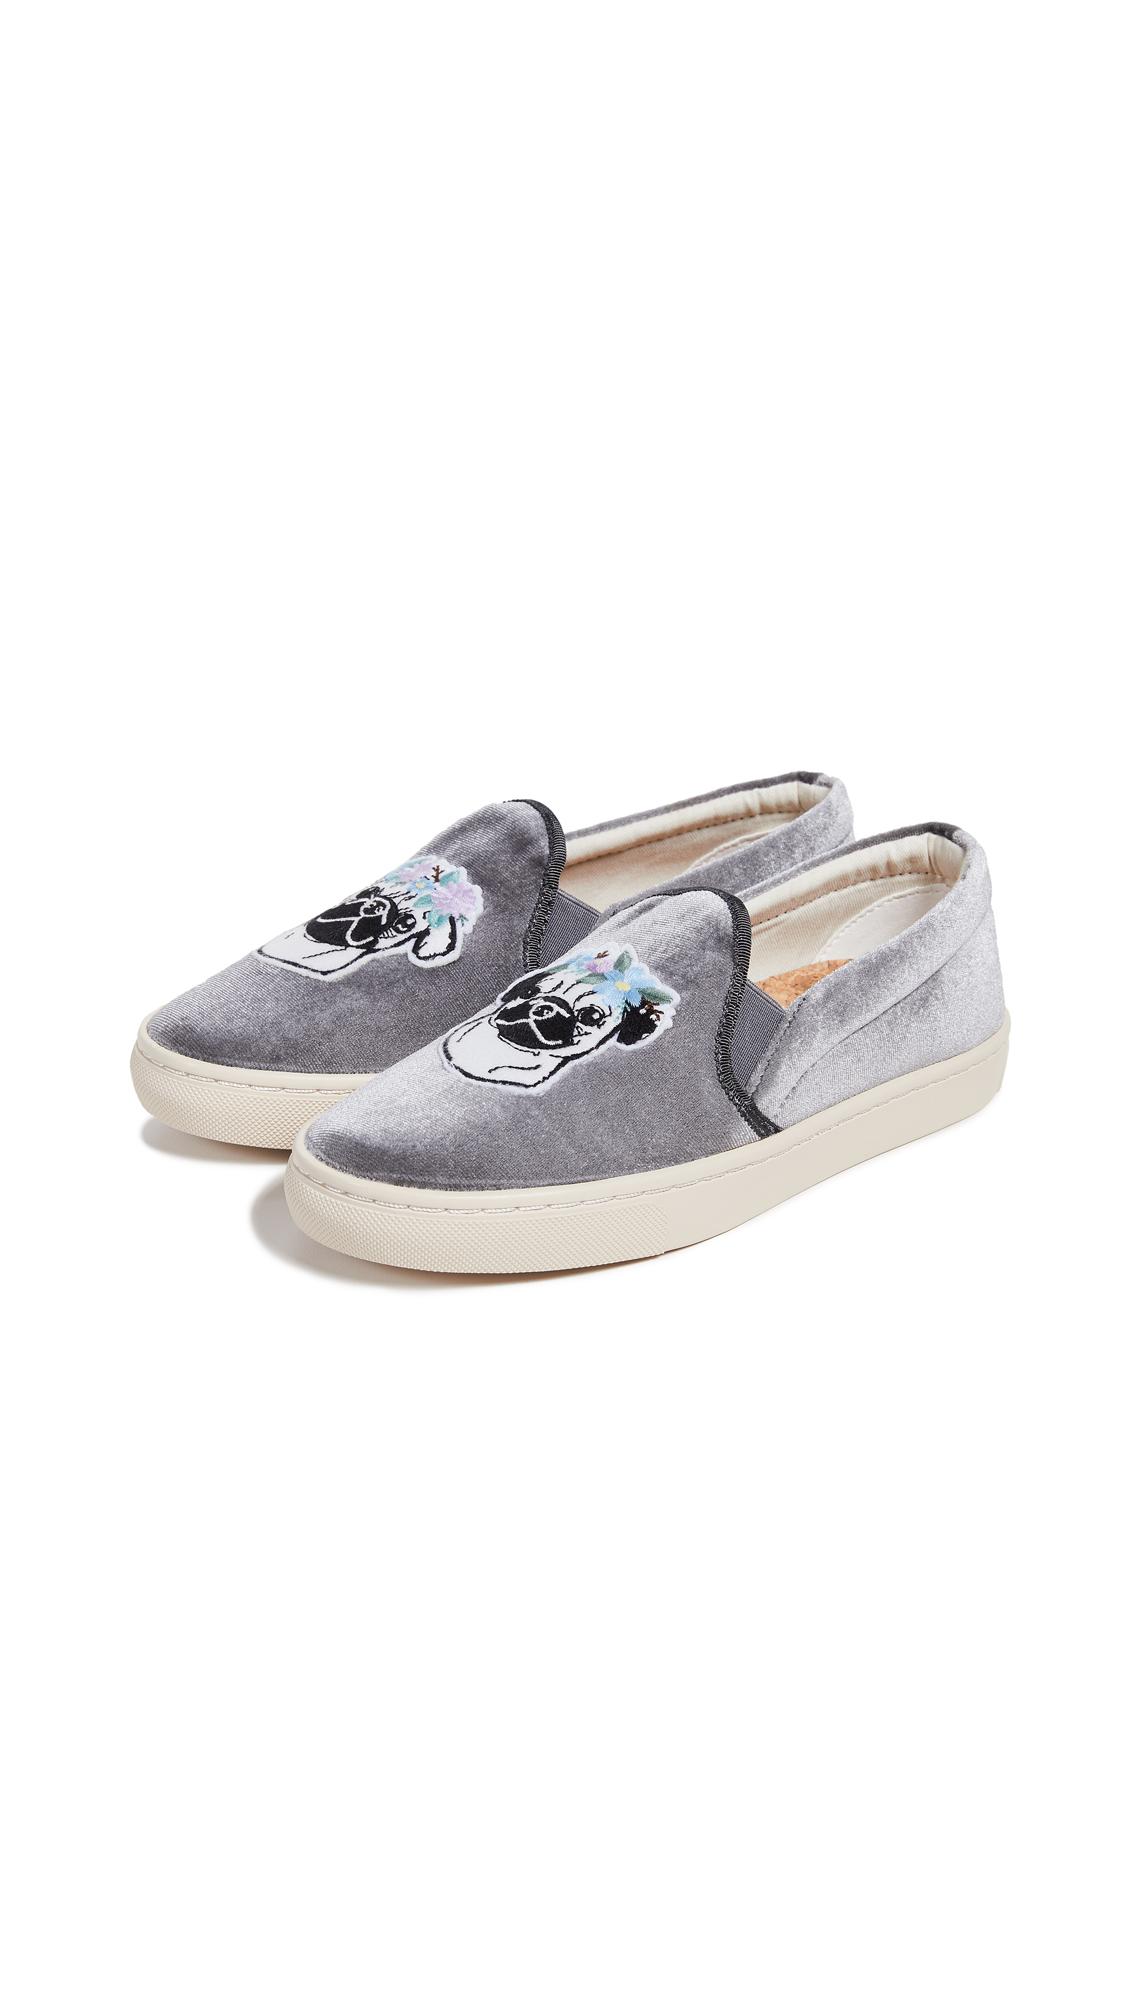 Soludos Flower Pug Slip On Sneakers - Gray